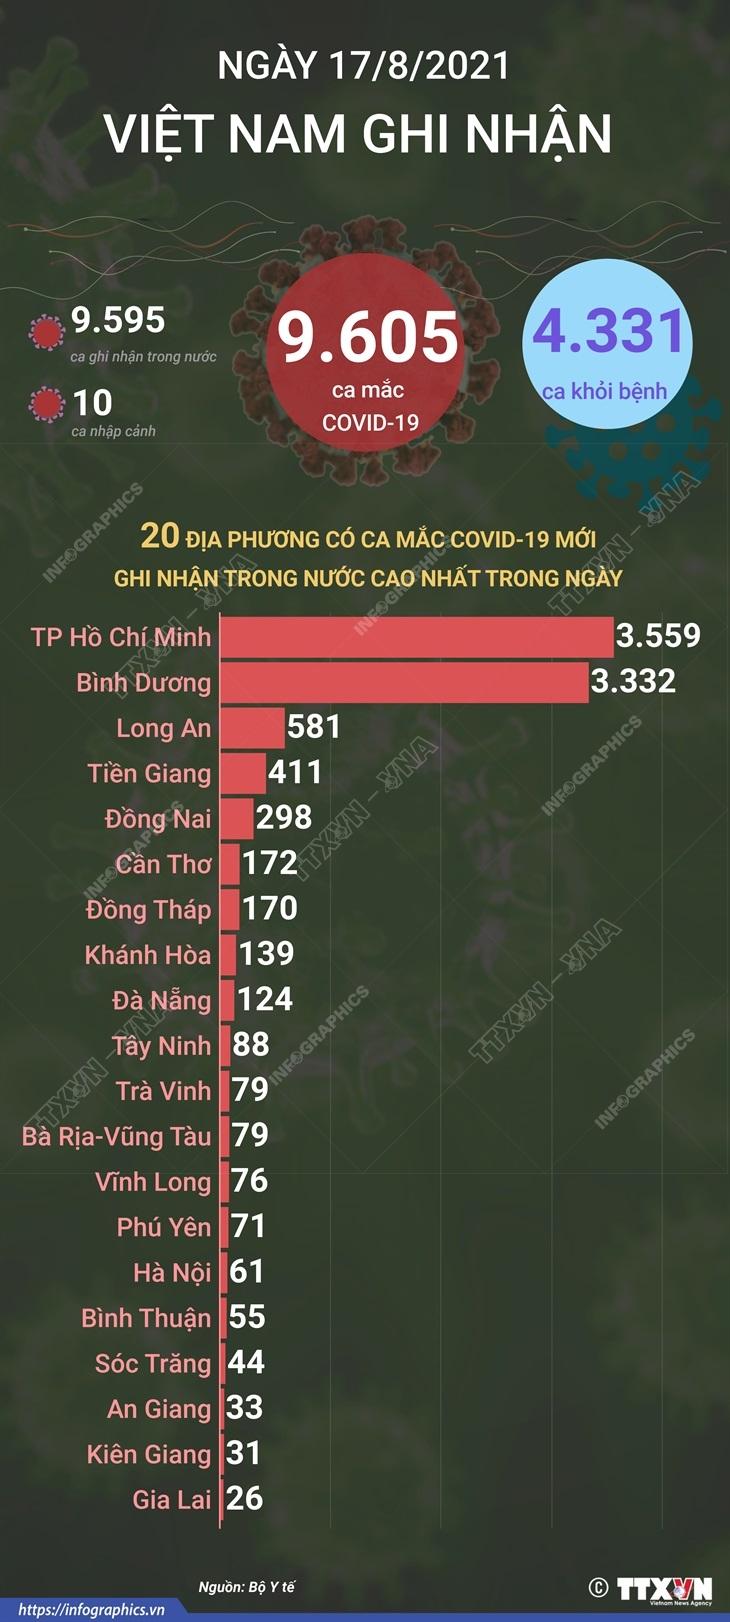 20 tinh thanh co so ca nhiem moi COVID-19 cao nhat trong ngay 17/8 hinh anh 1